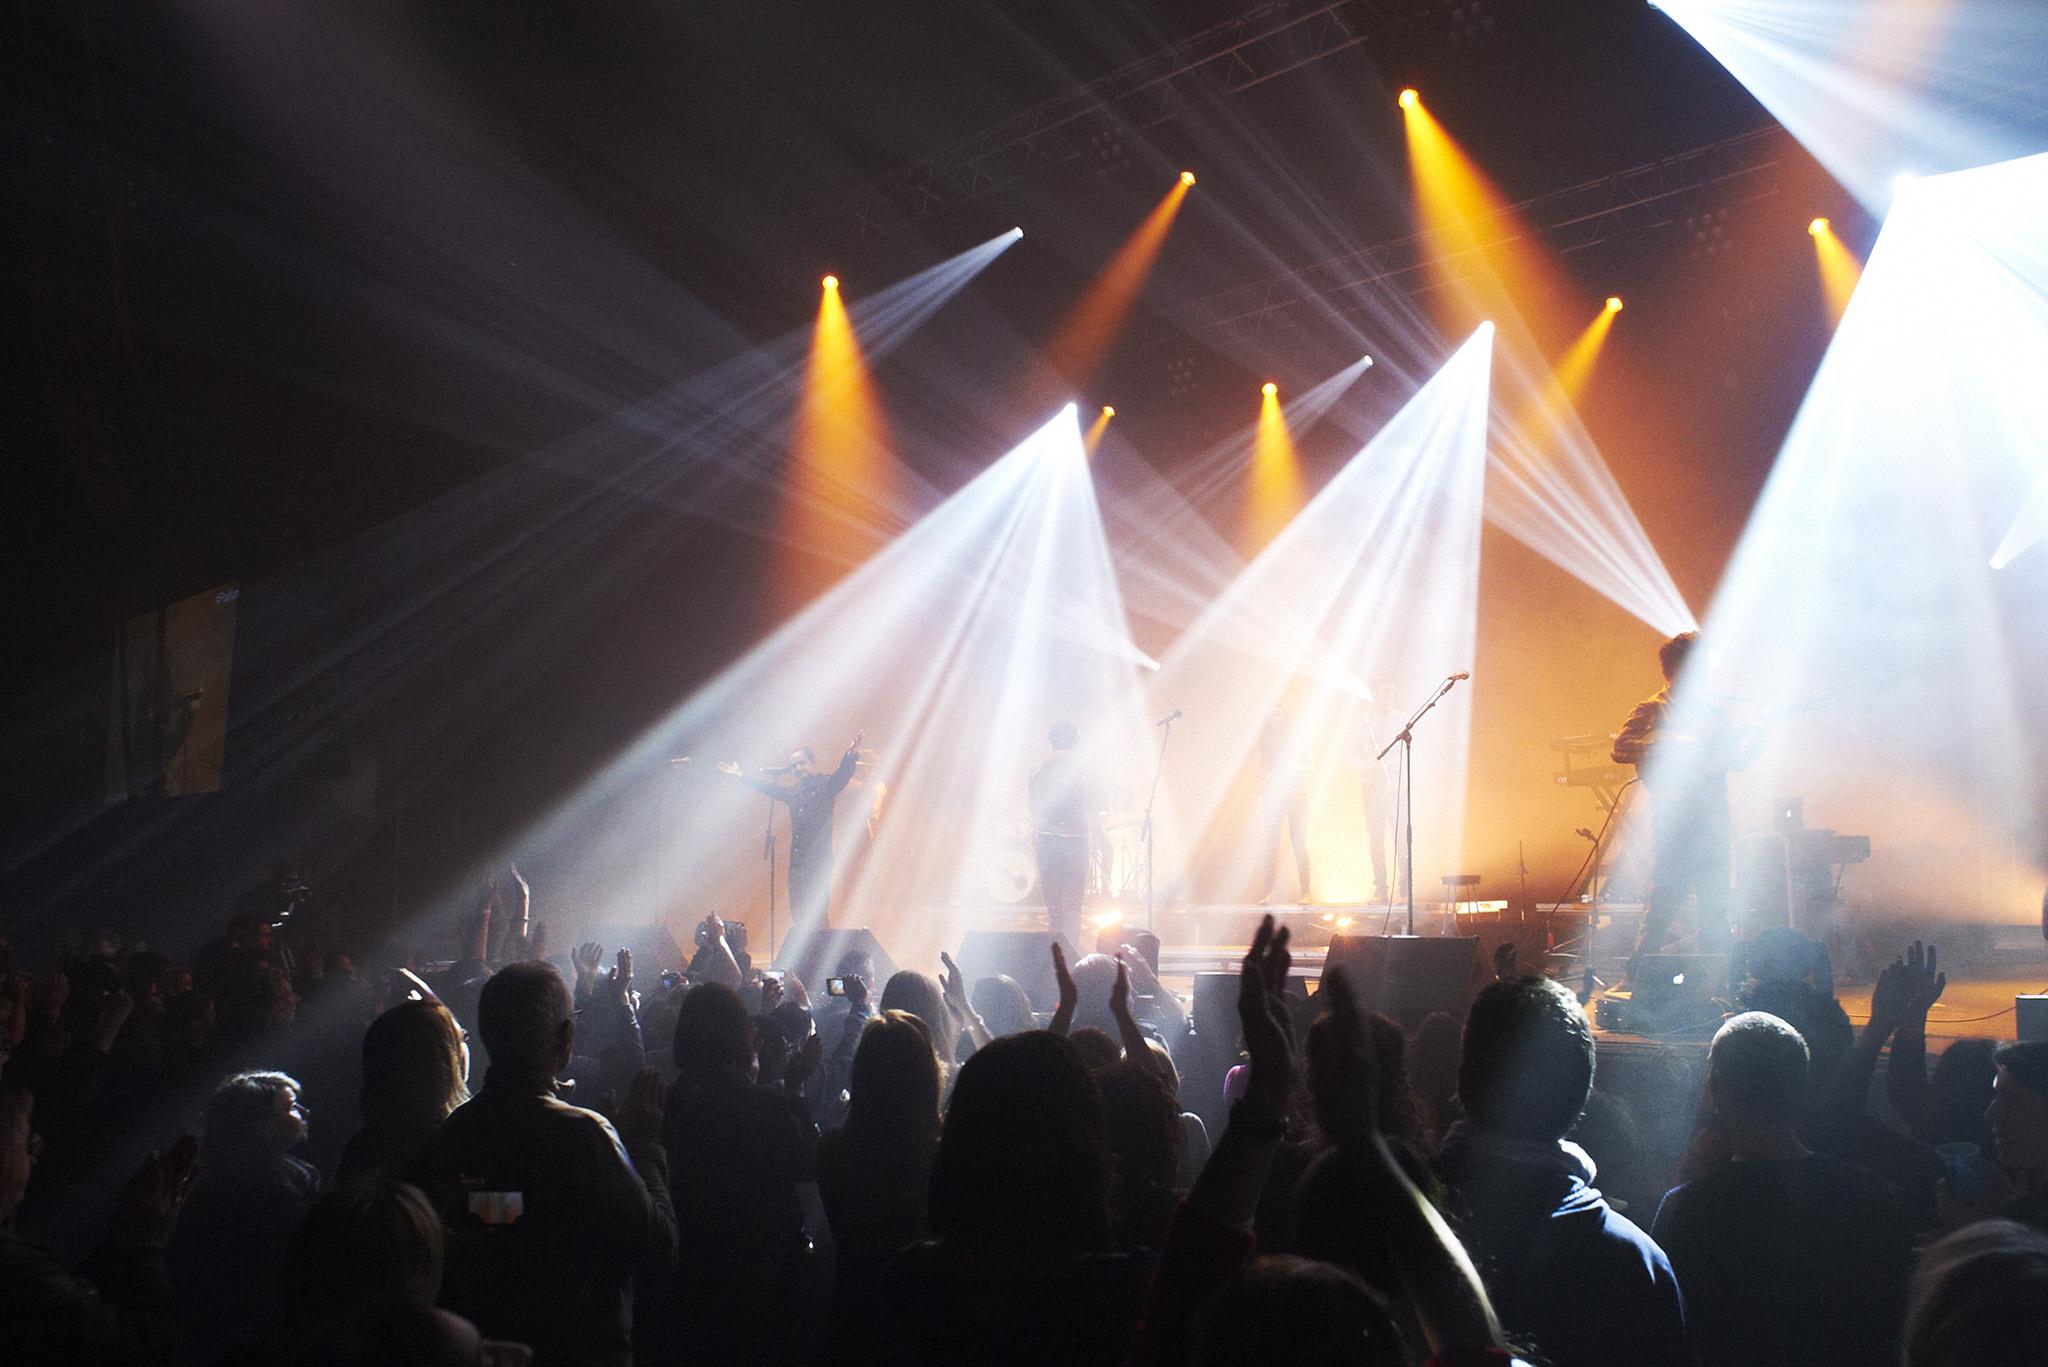 Spectacle / Concert / Theatre